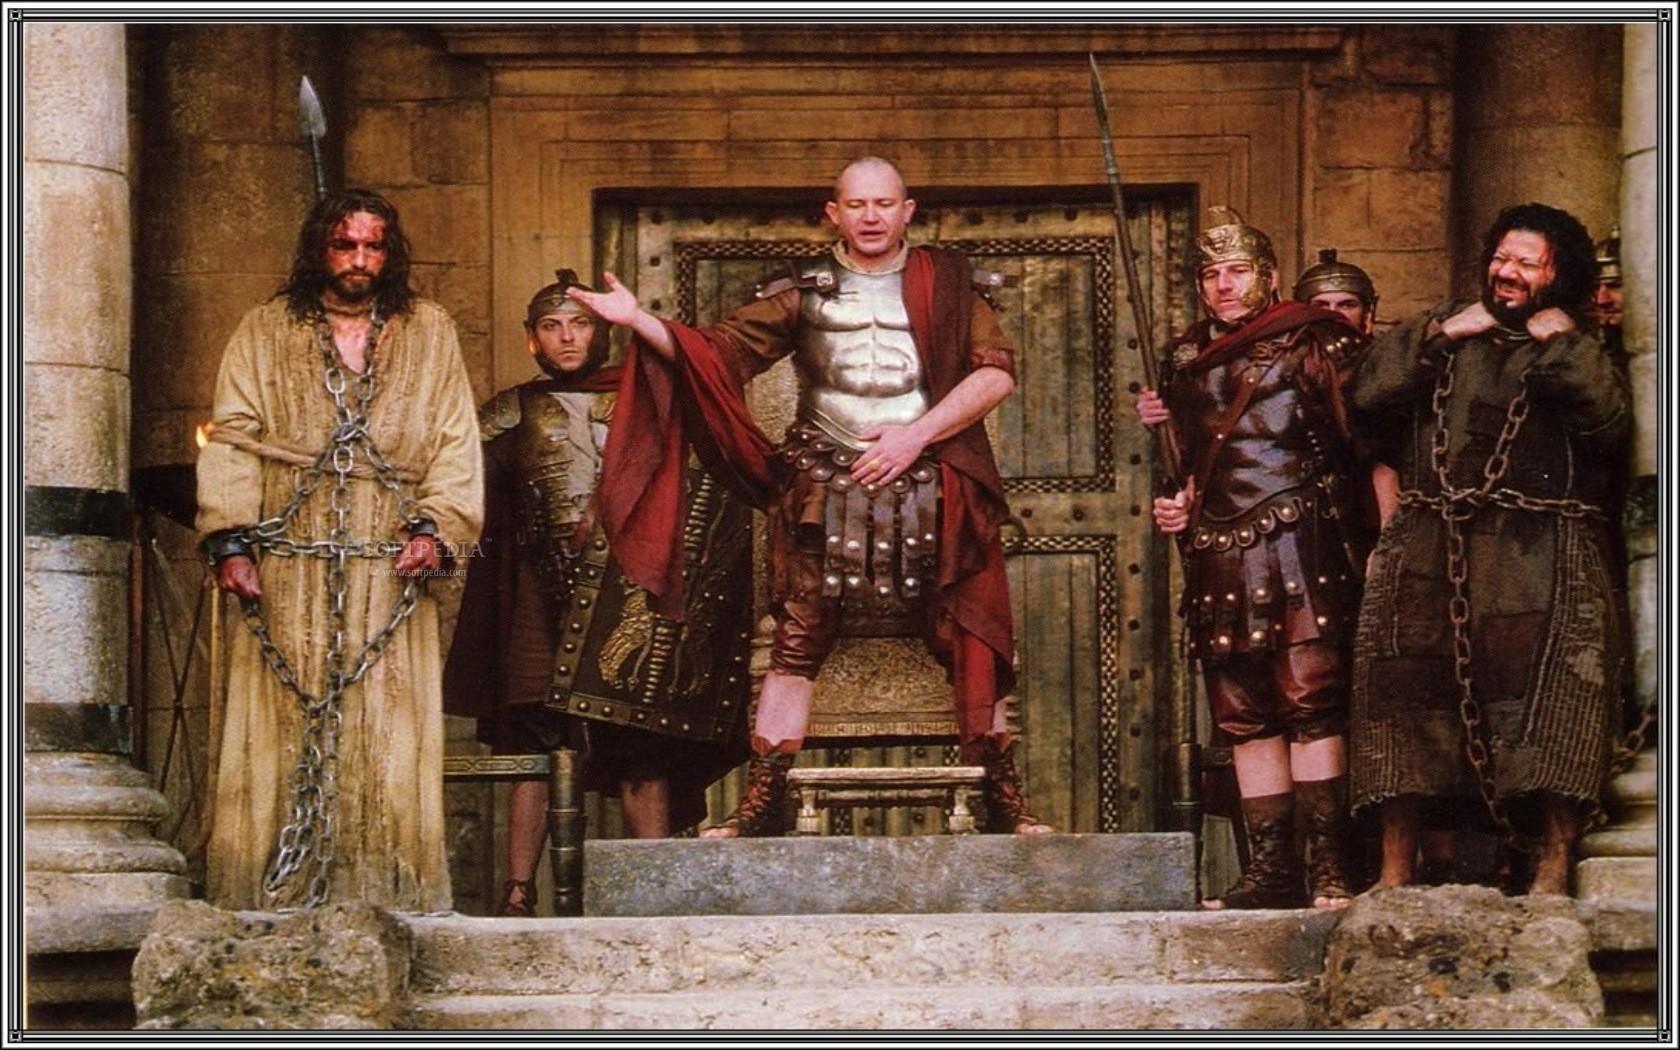 Pontius Pilate presents the 2 options for pardon.